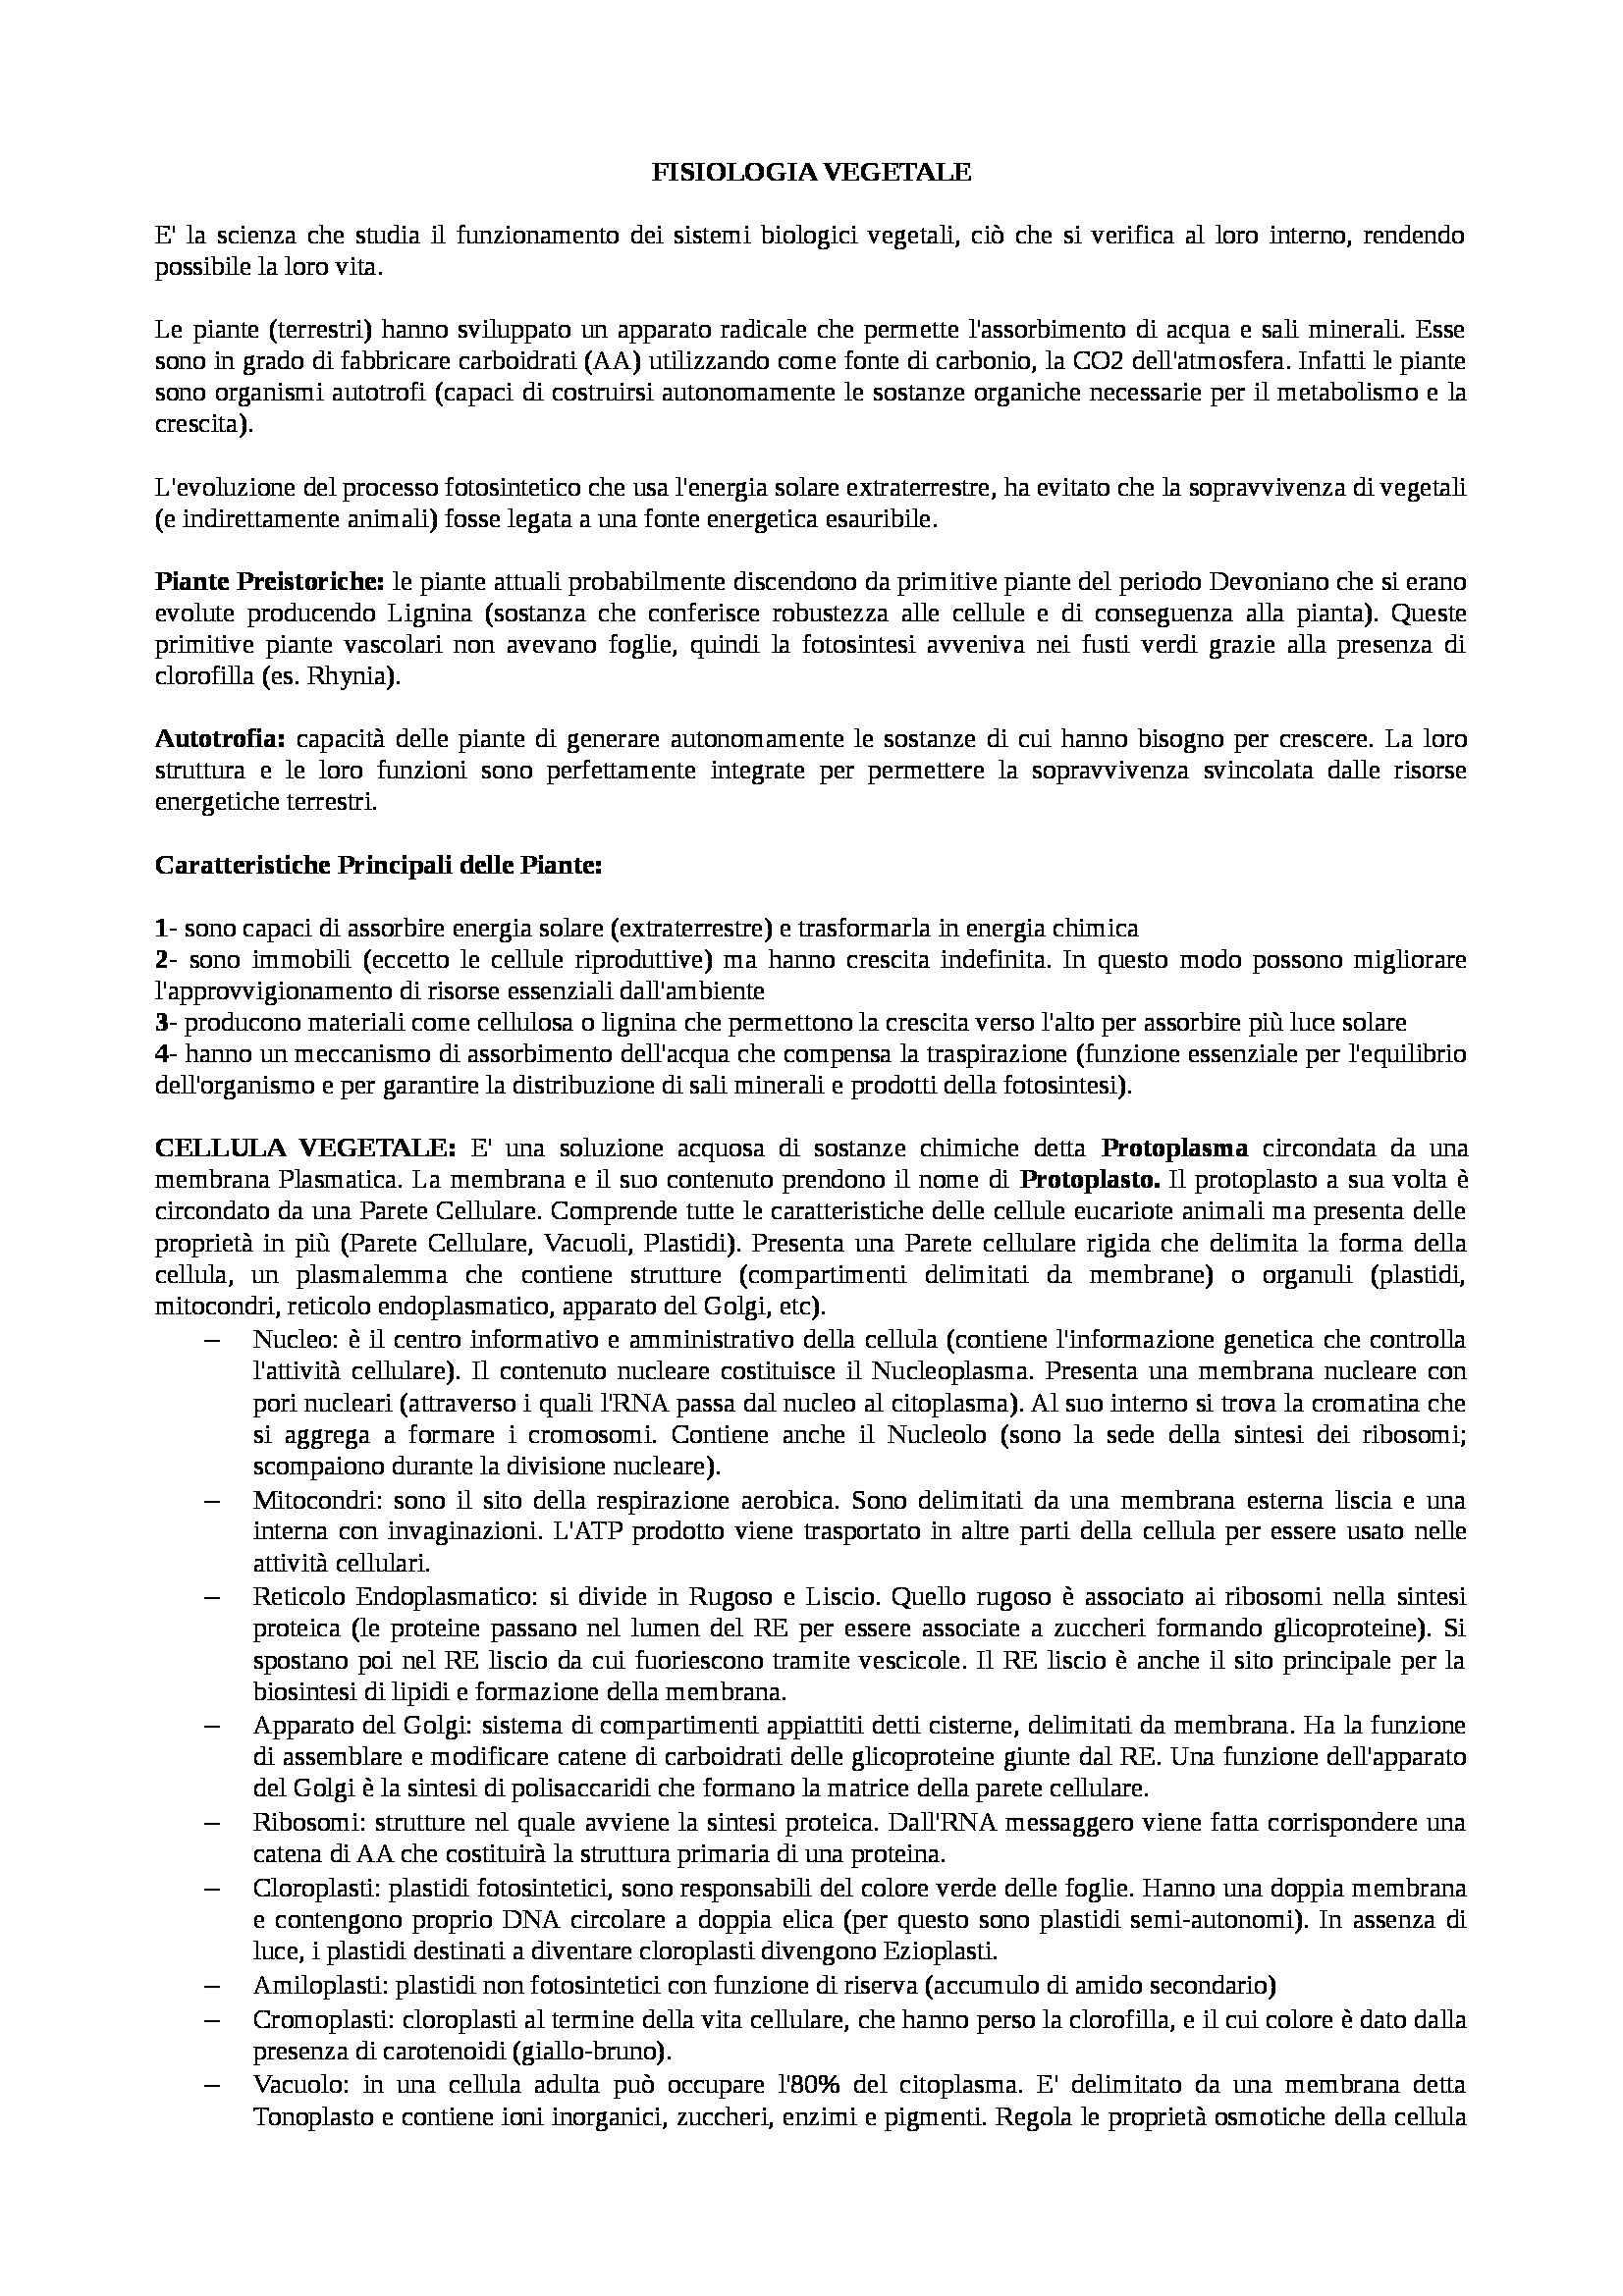 appunto R. Gabbrielli Fisiologia vegetale